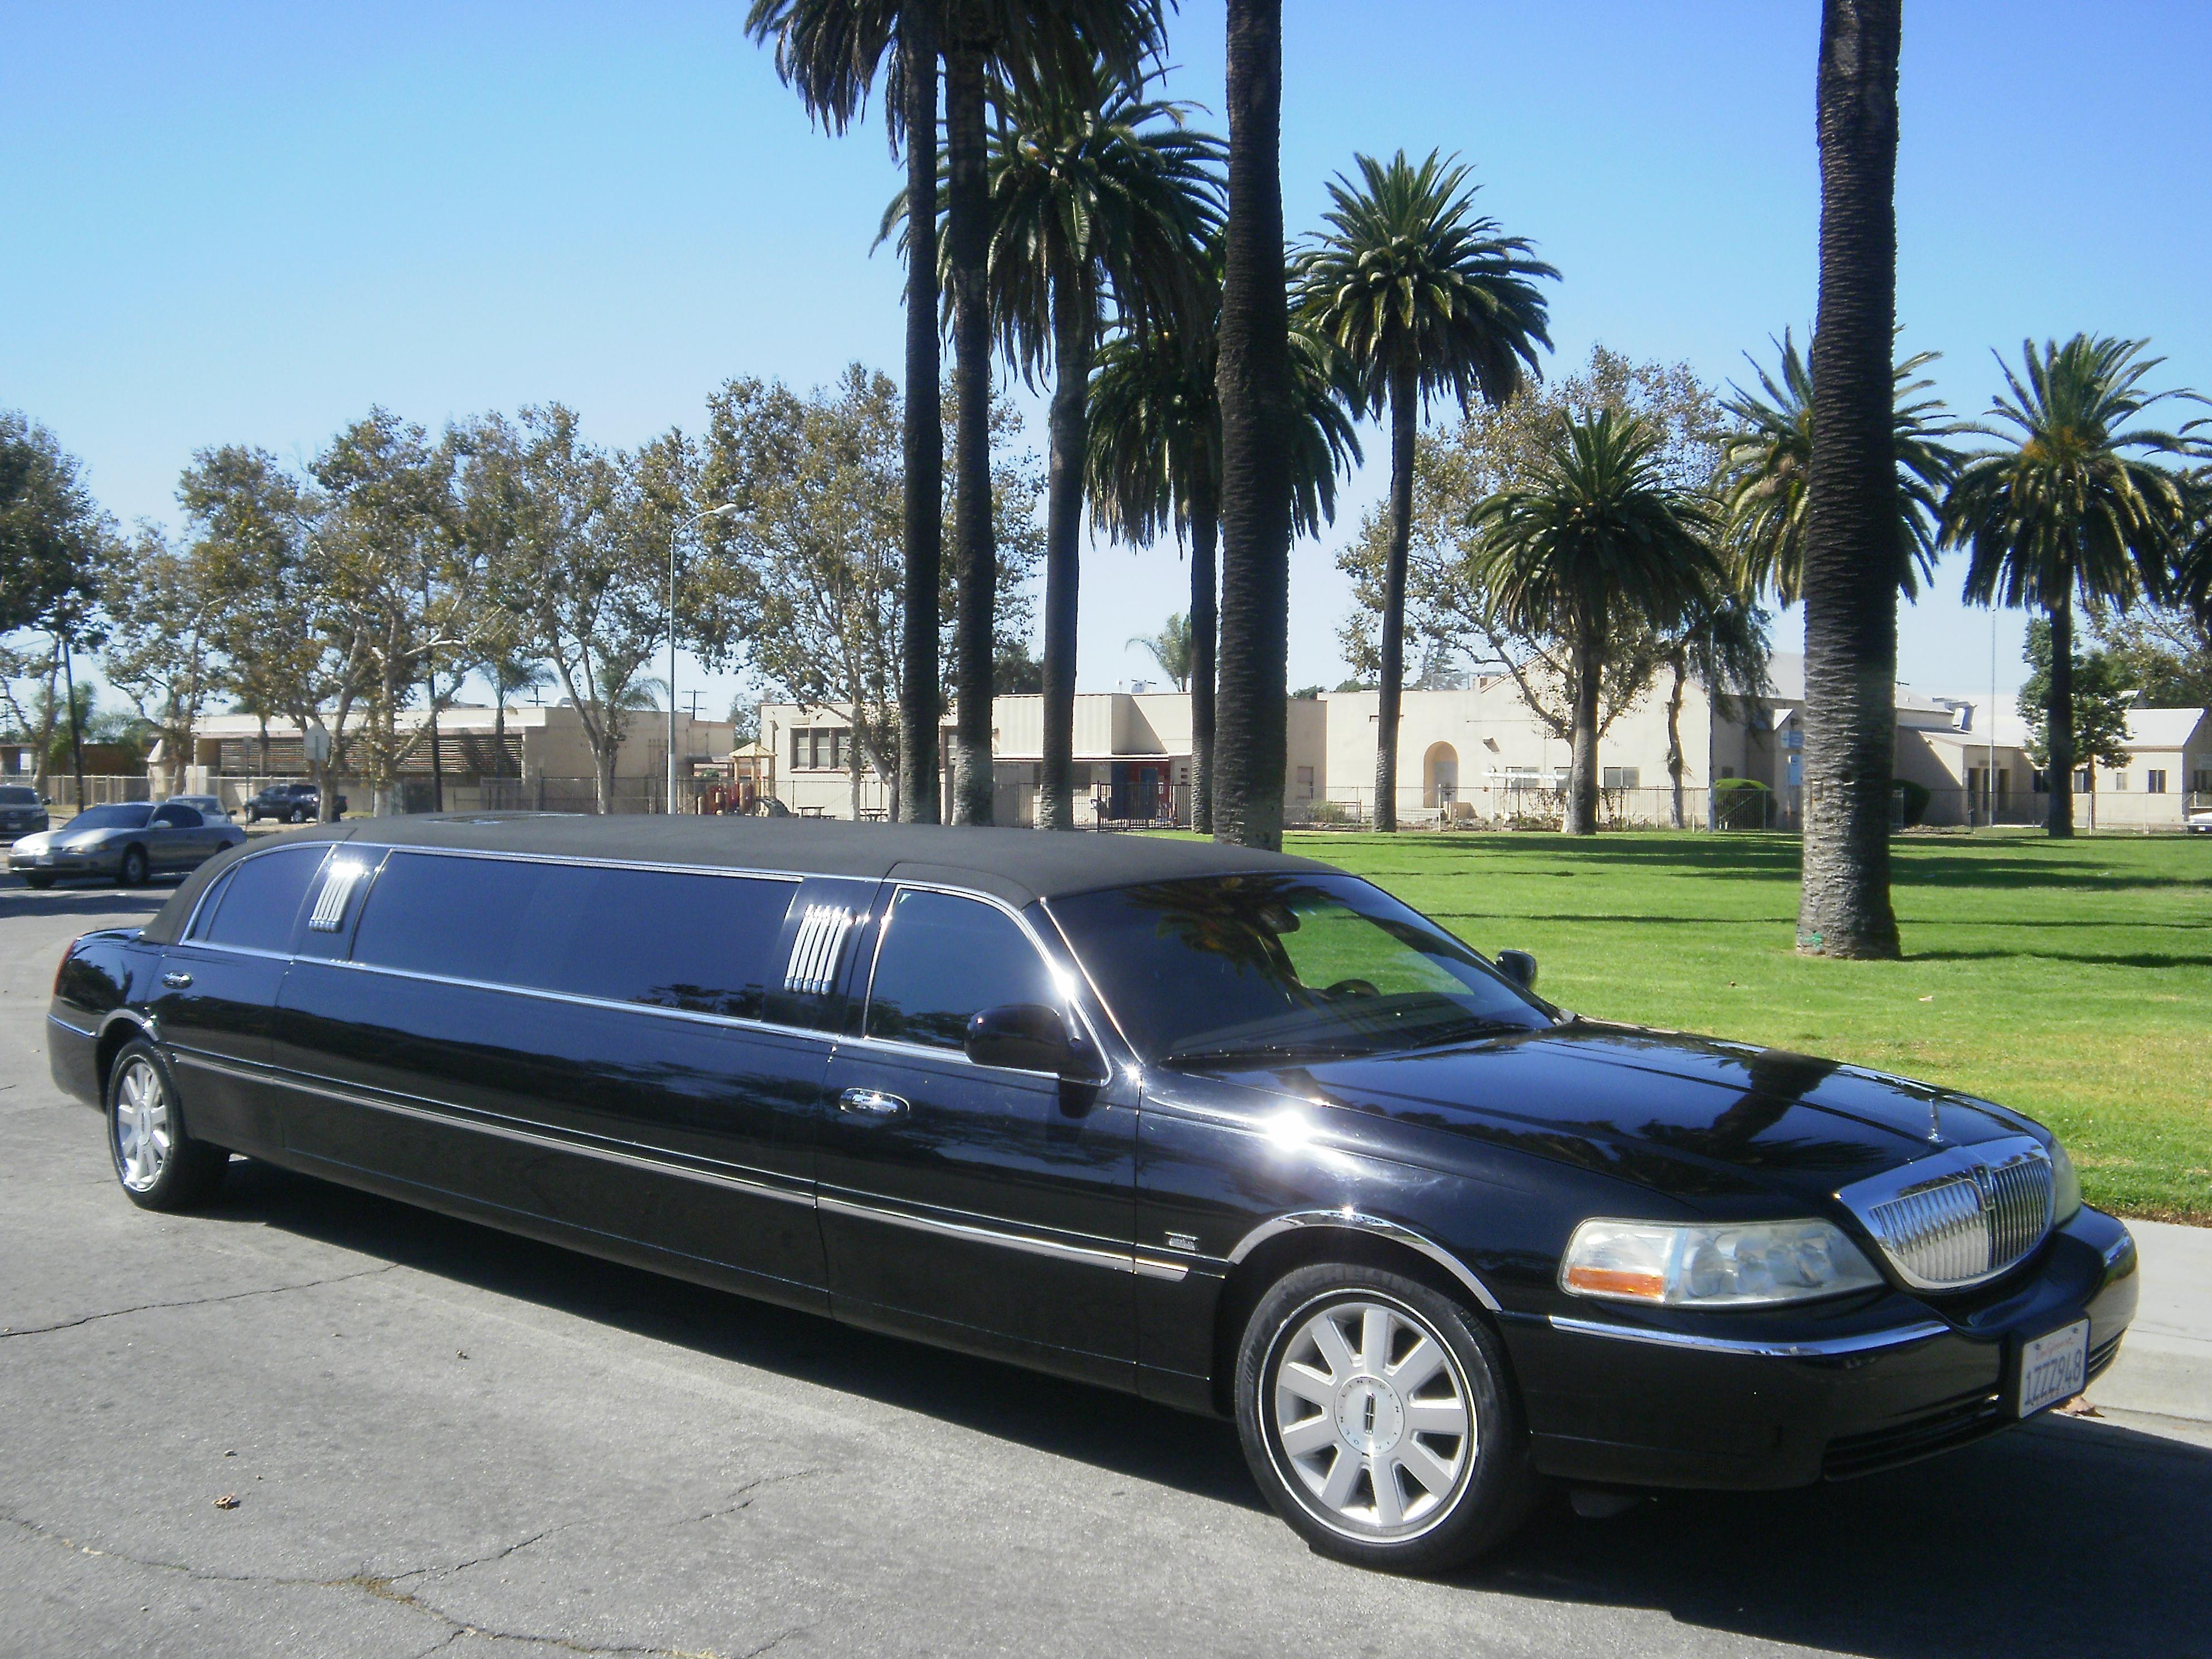 Black Lincoln Town Car 120 Inch Limousine 1076